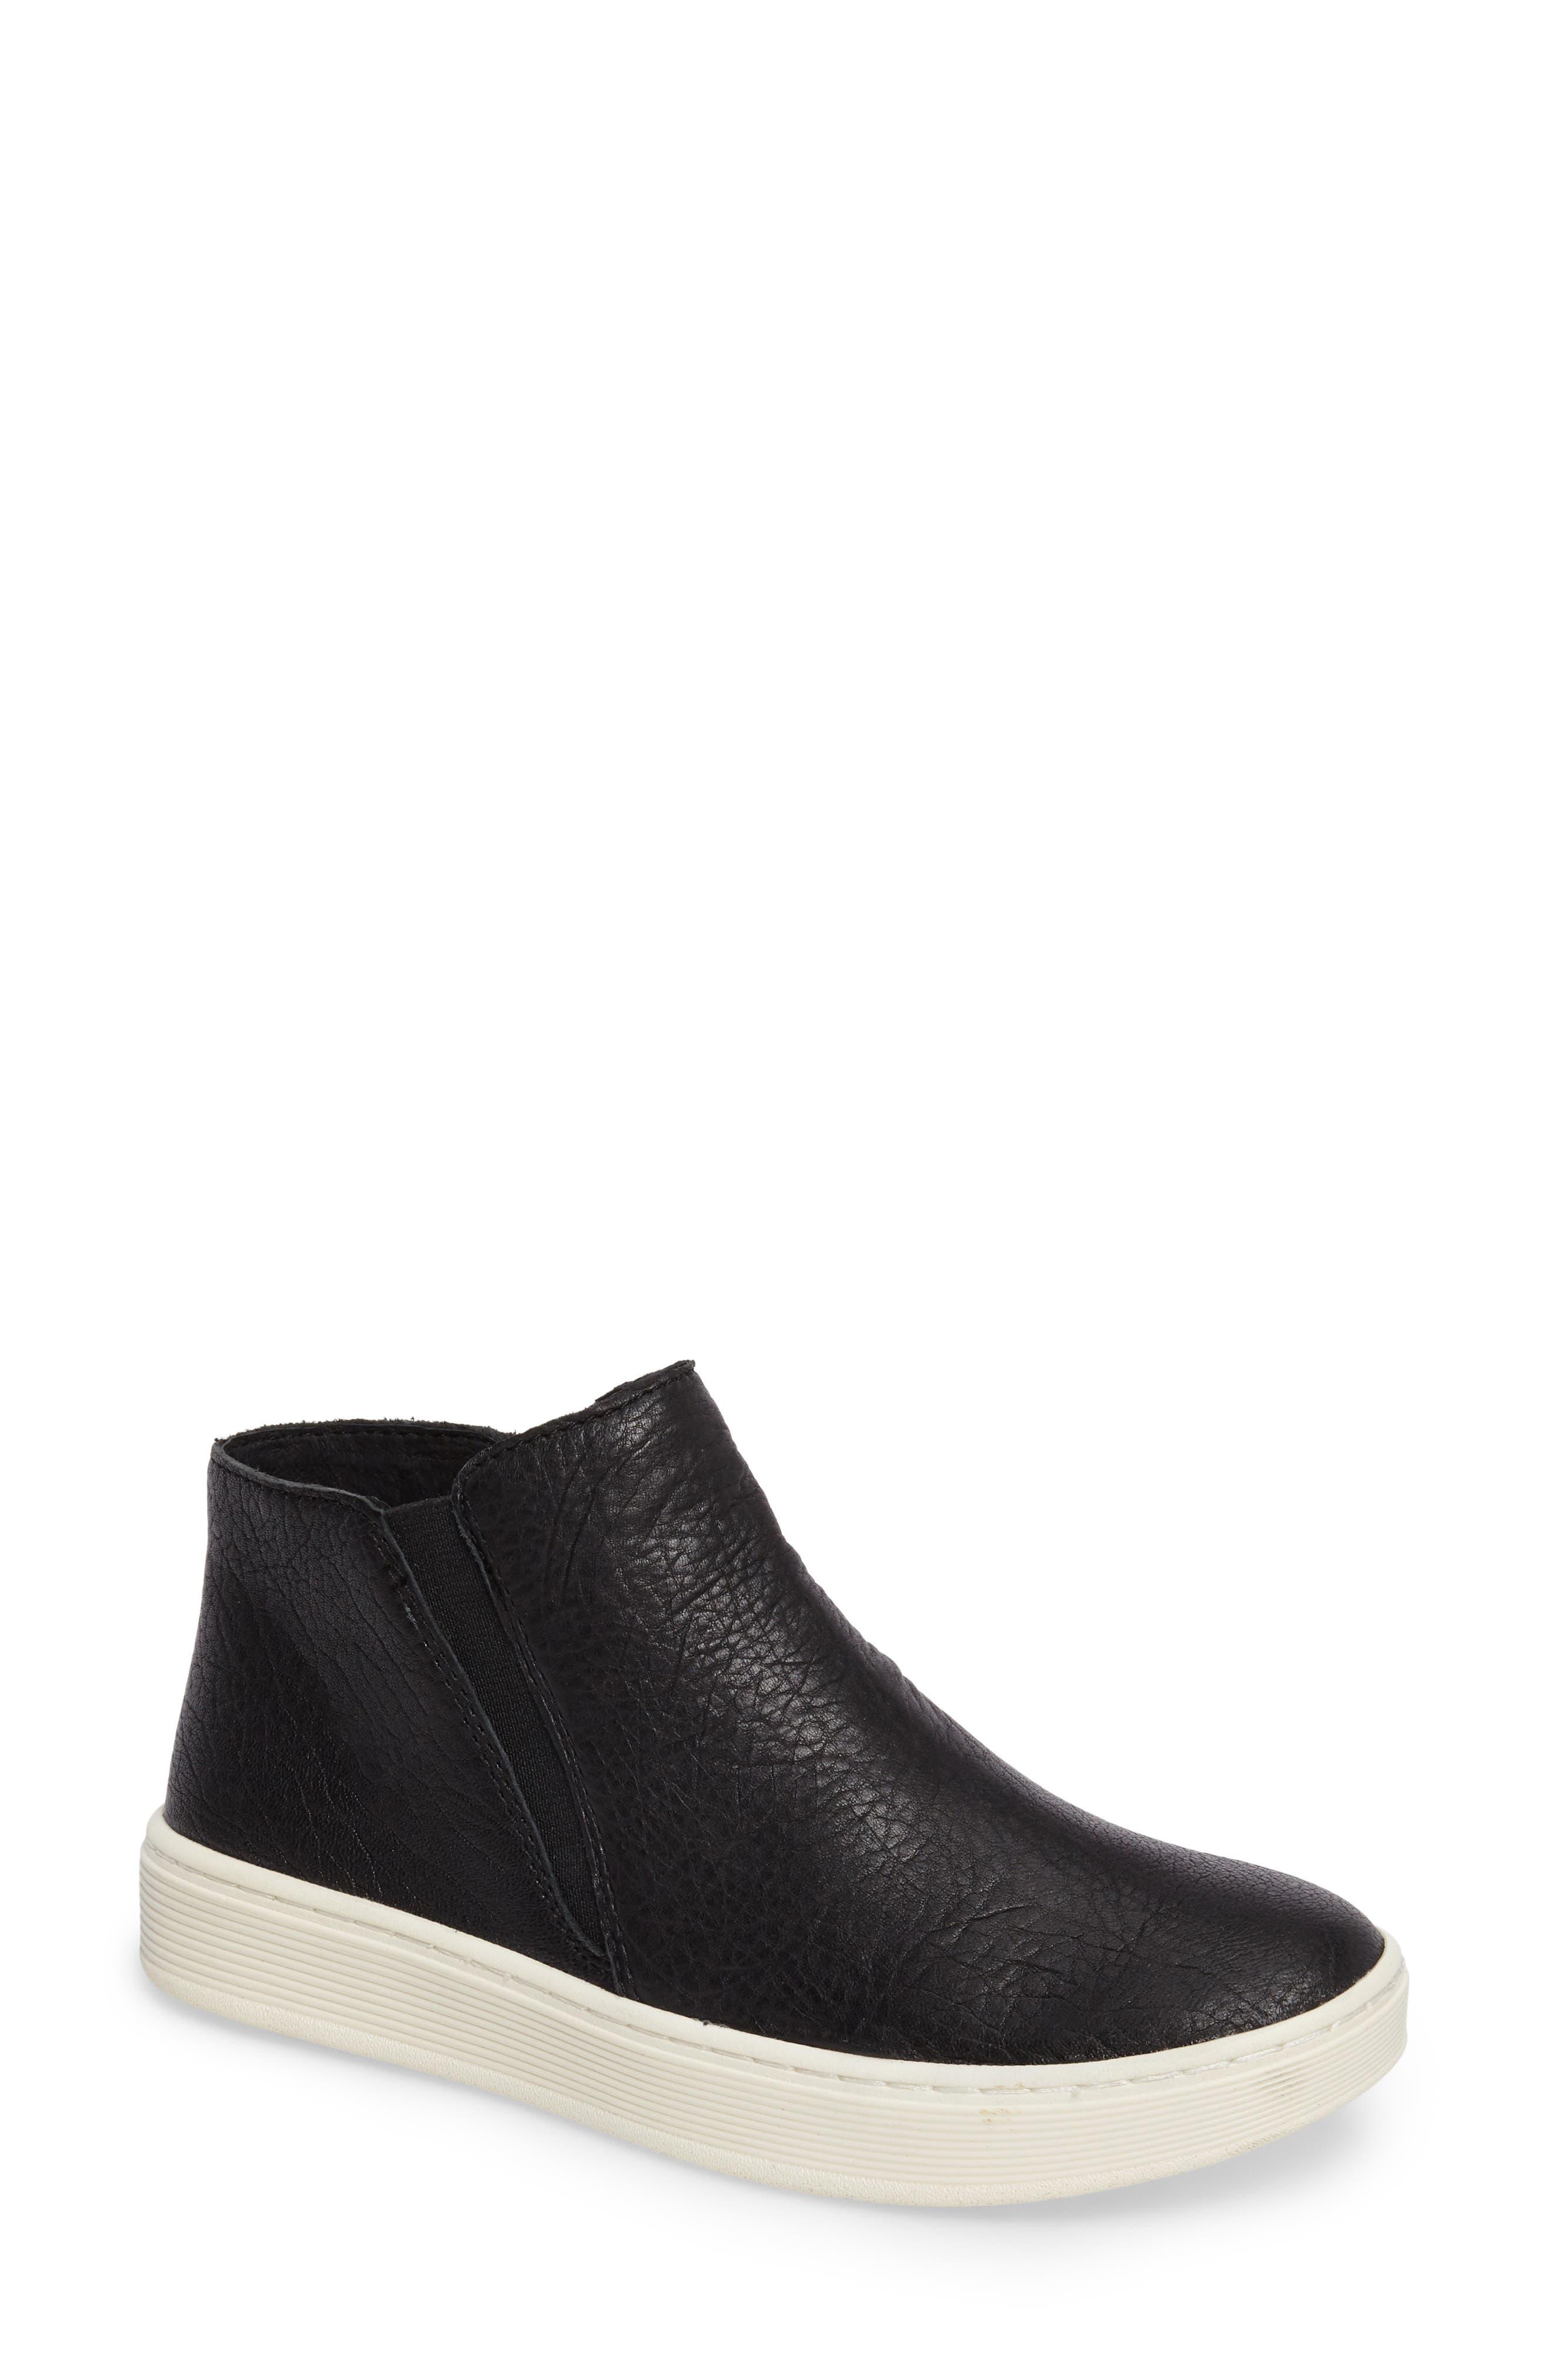 Britton Chelsea Sneaker,                             Main thumbnail 1, color,                             BLACK LEATHER